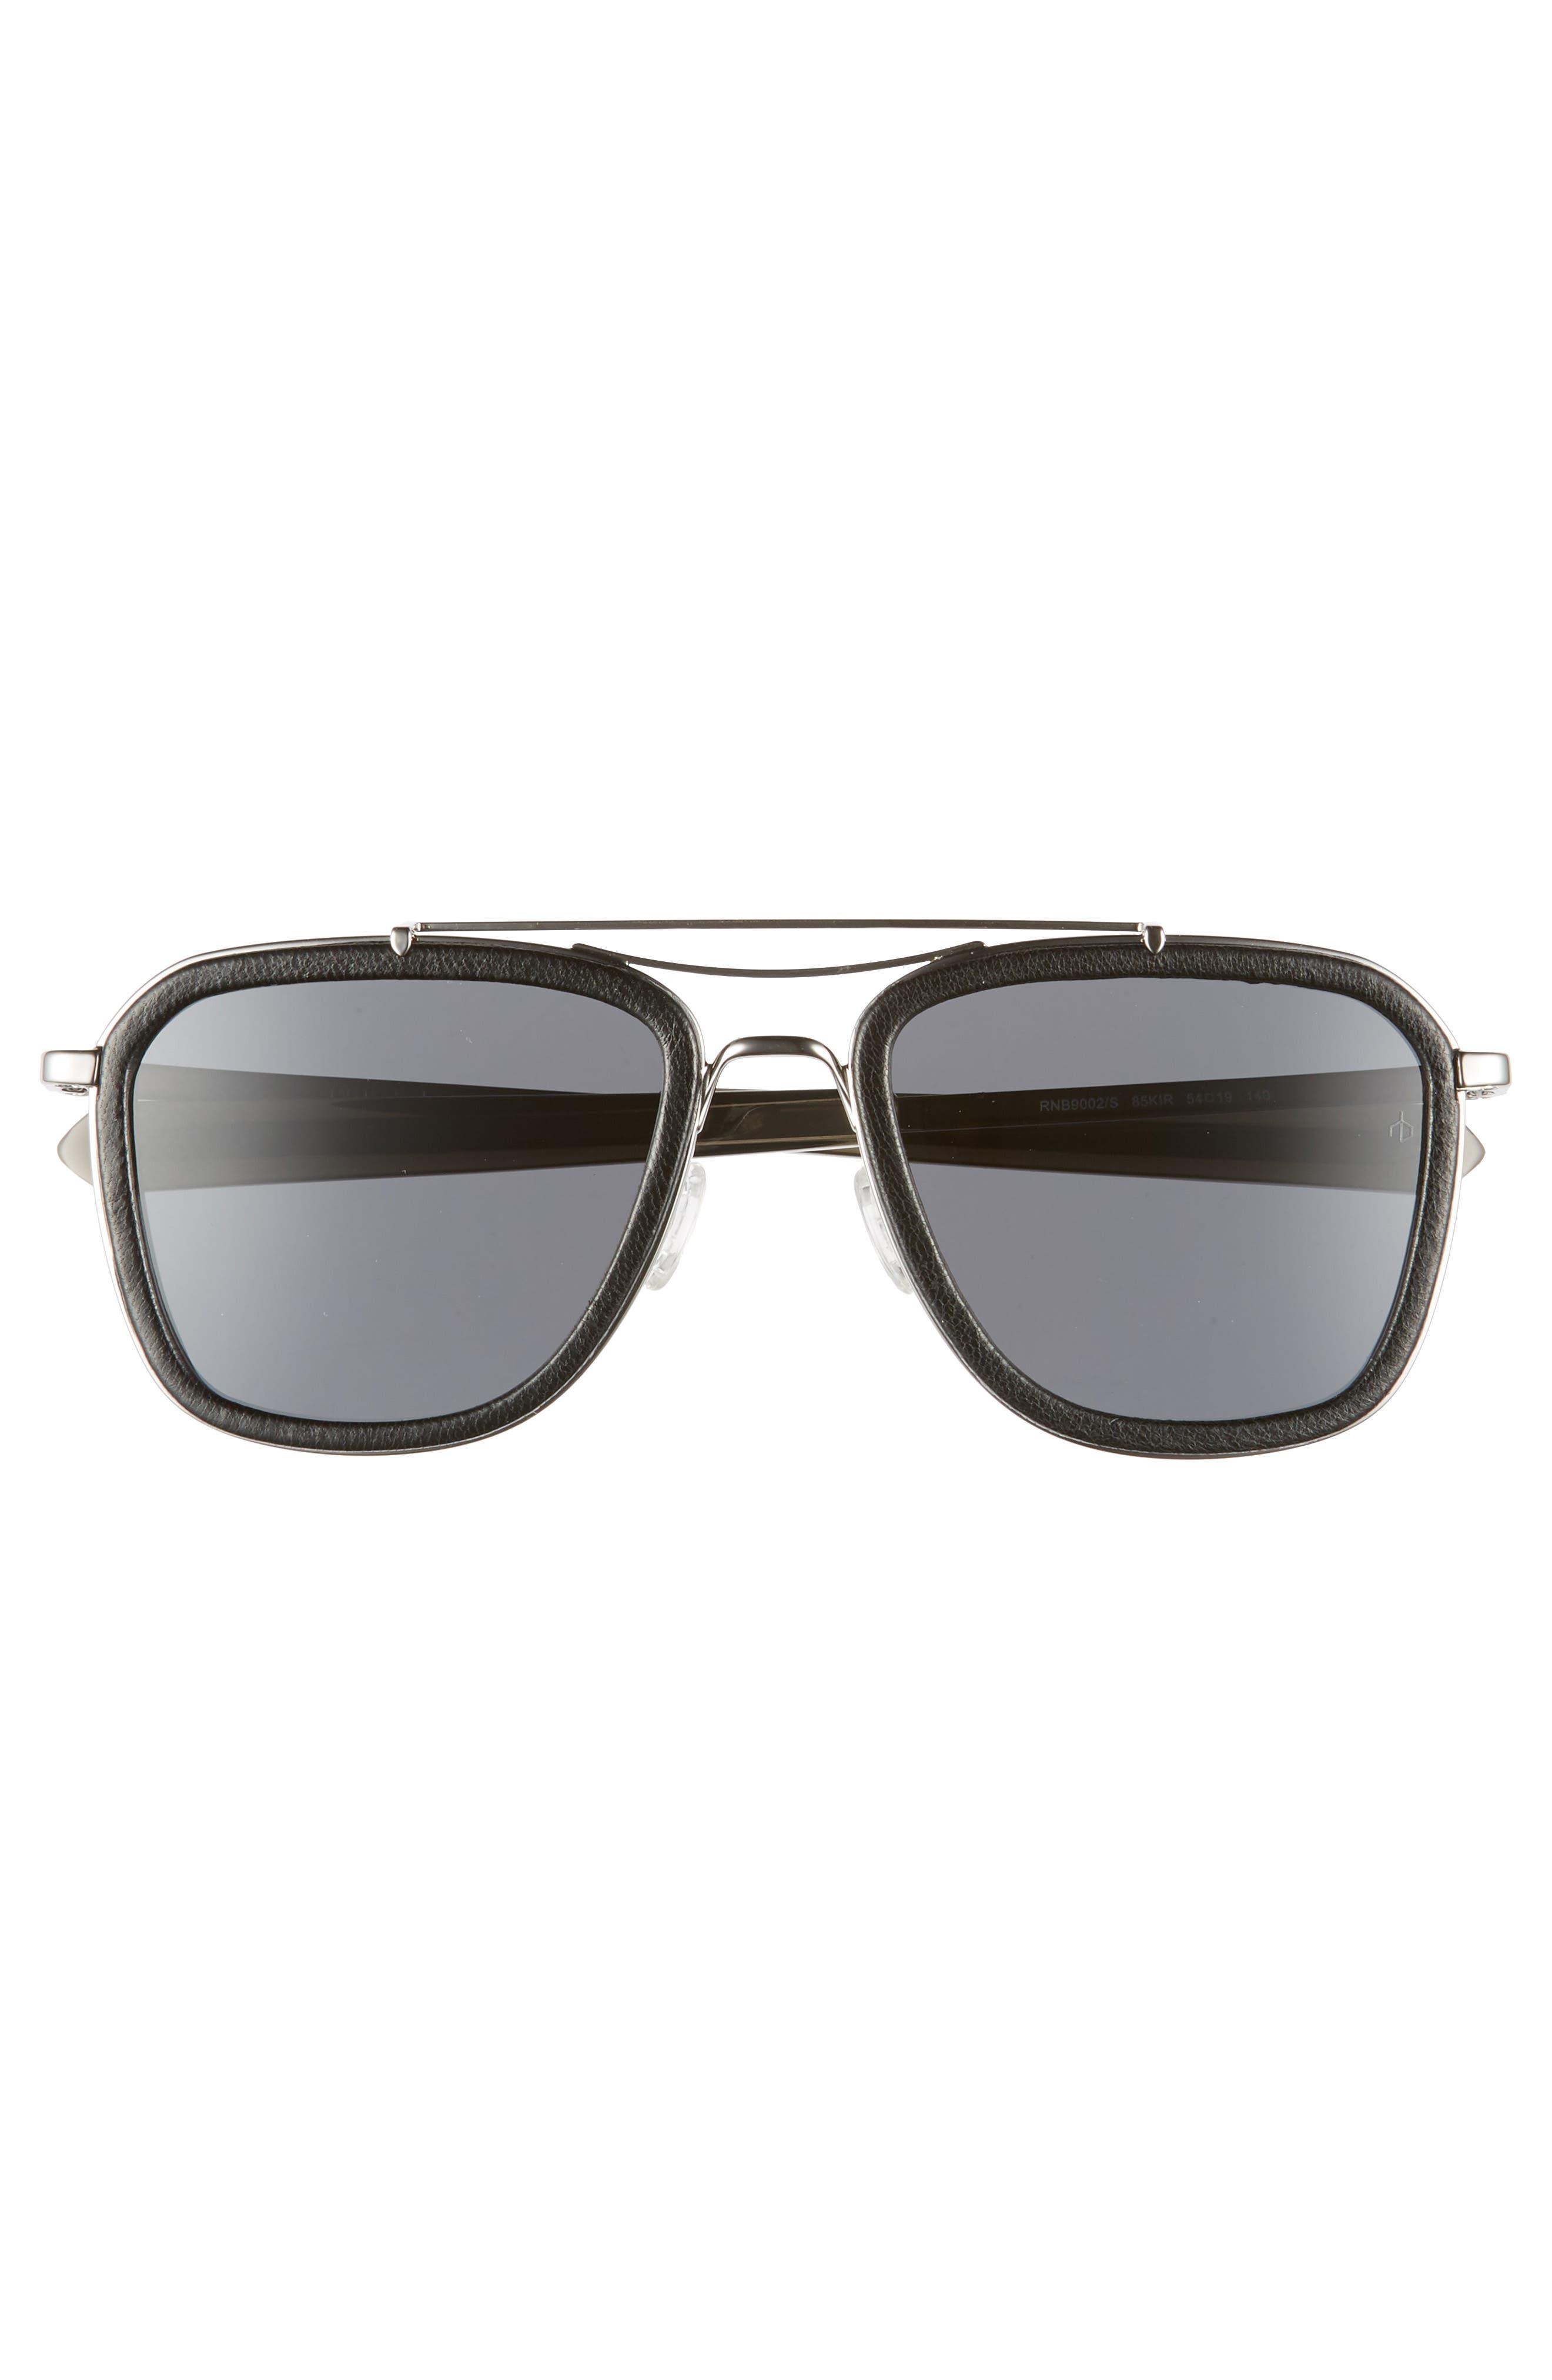 Phantom 54mm Aviator Sunglasses,                             Alternate thumbnail 3, color,                             RUTHENIUM/ BLACK